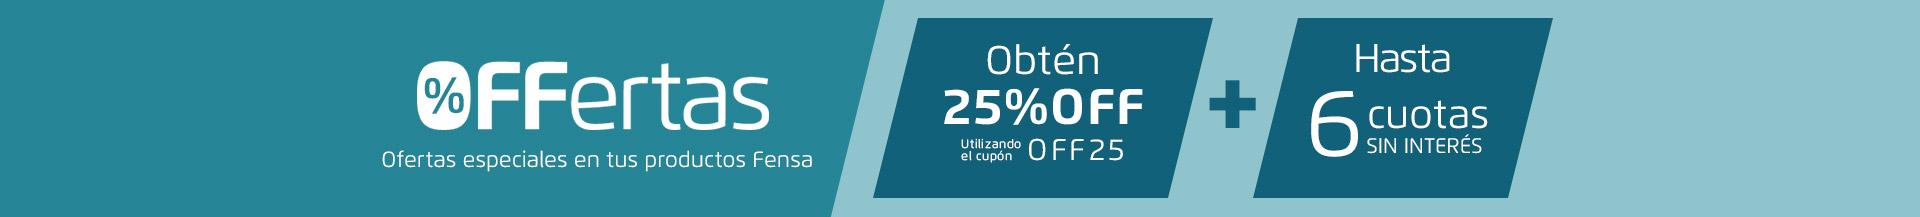 OFFerta 25% - Estufas